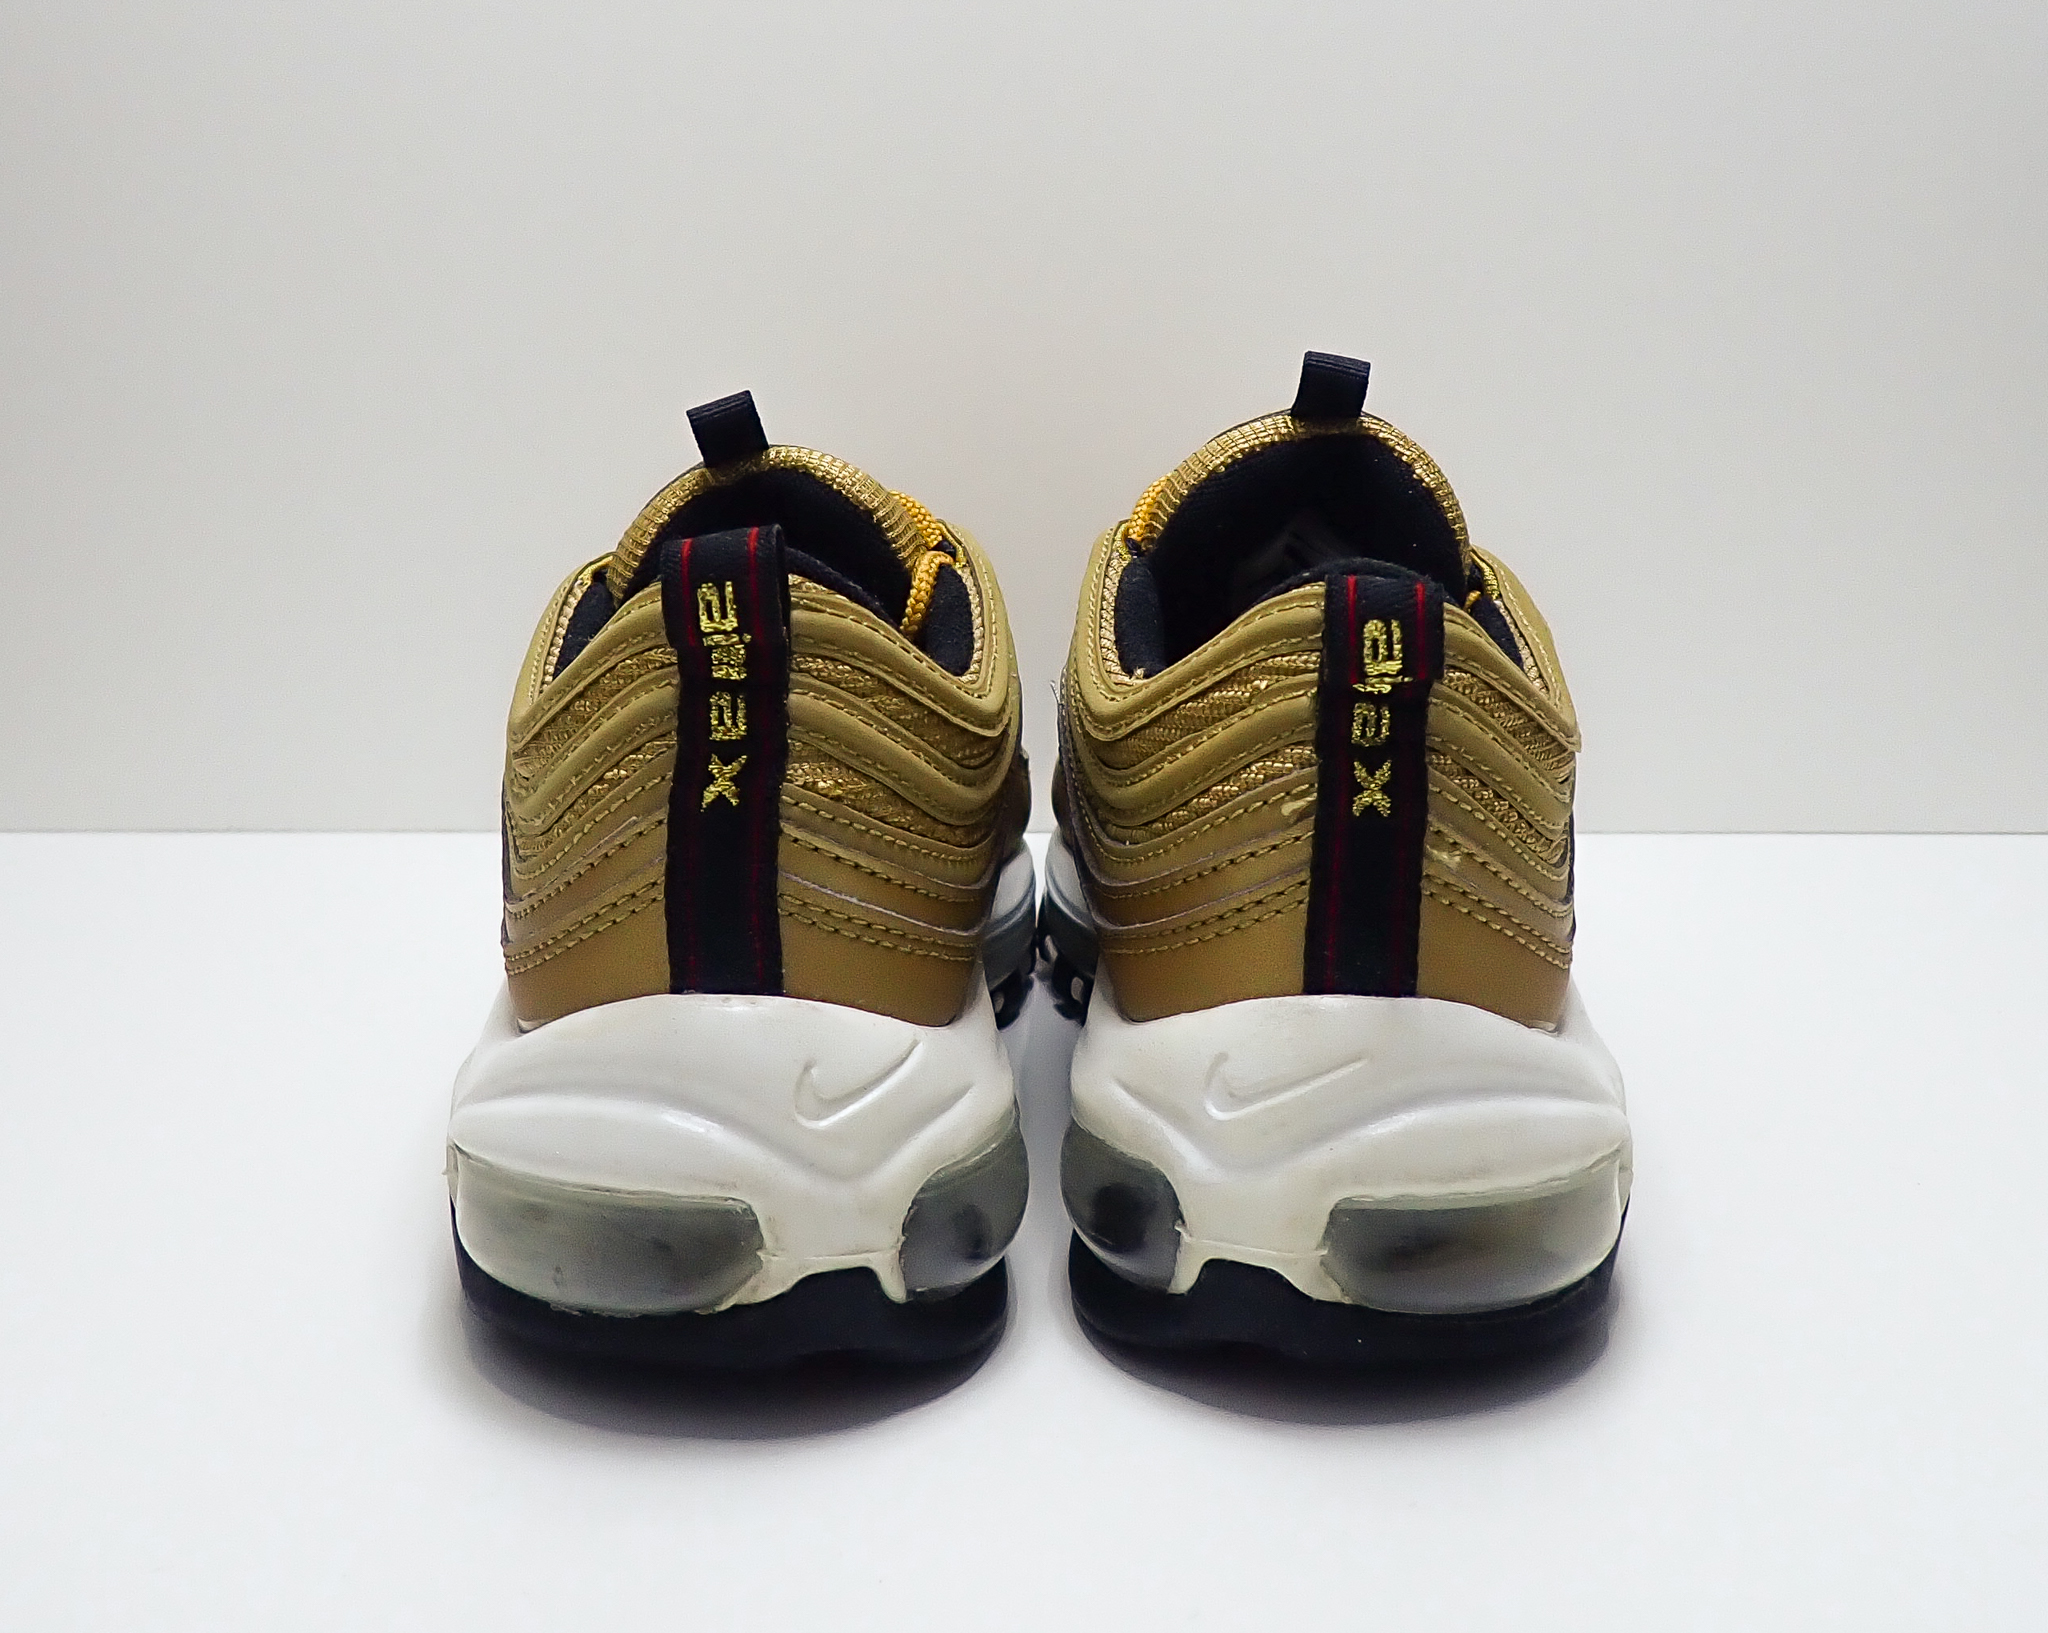 Nike W Air Max 97 Metallic Gold